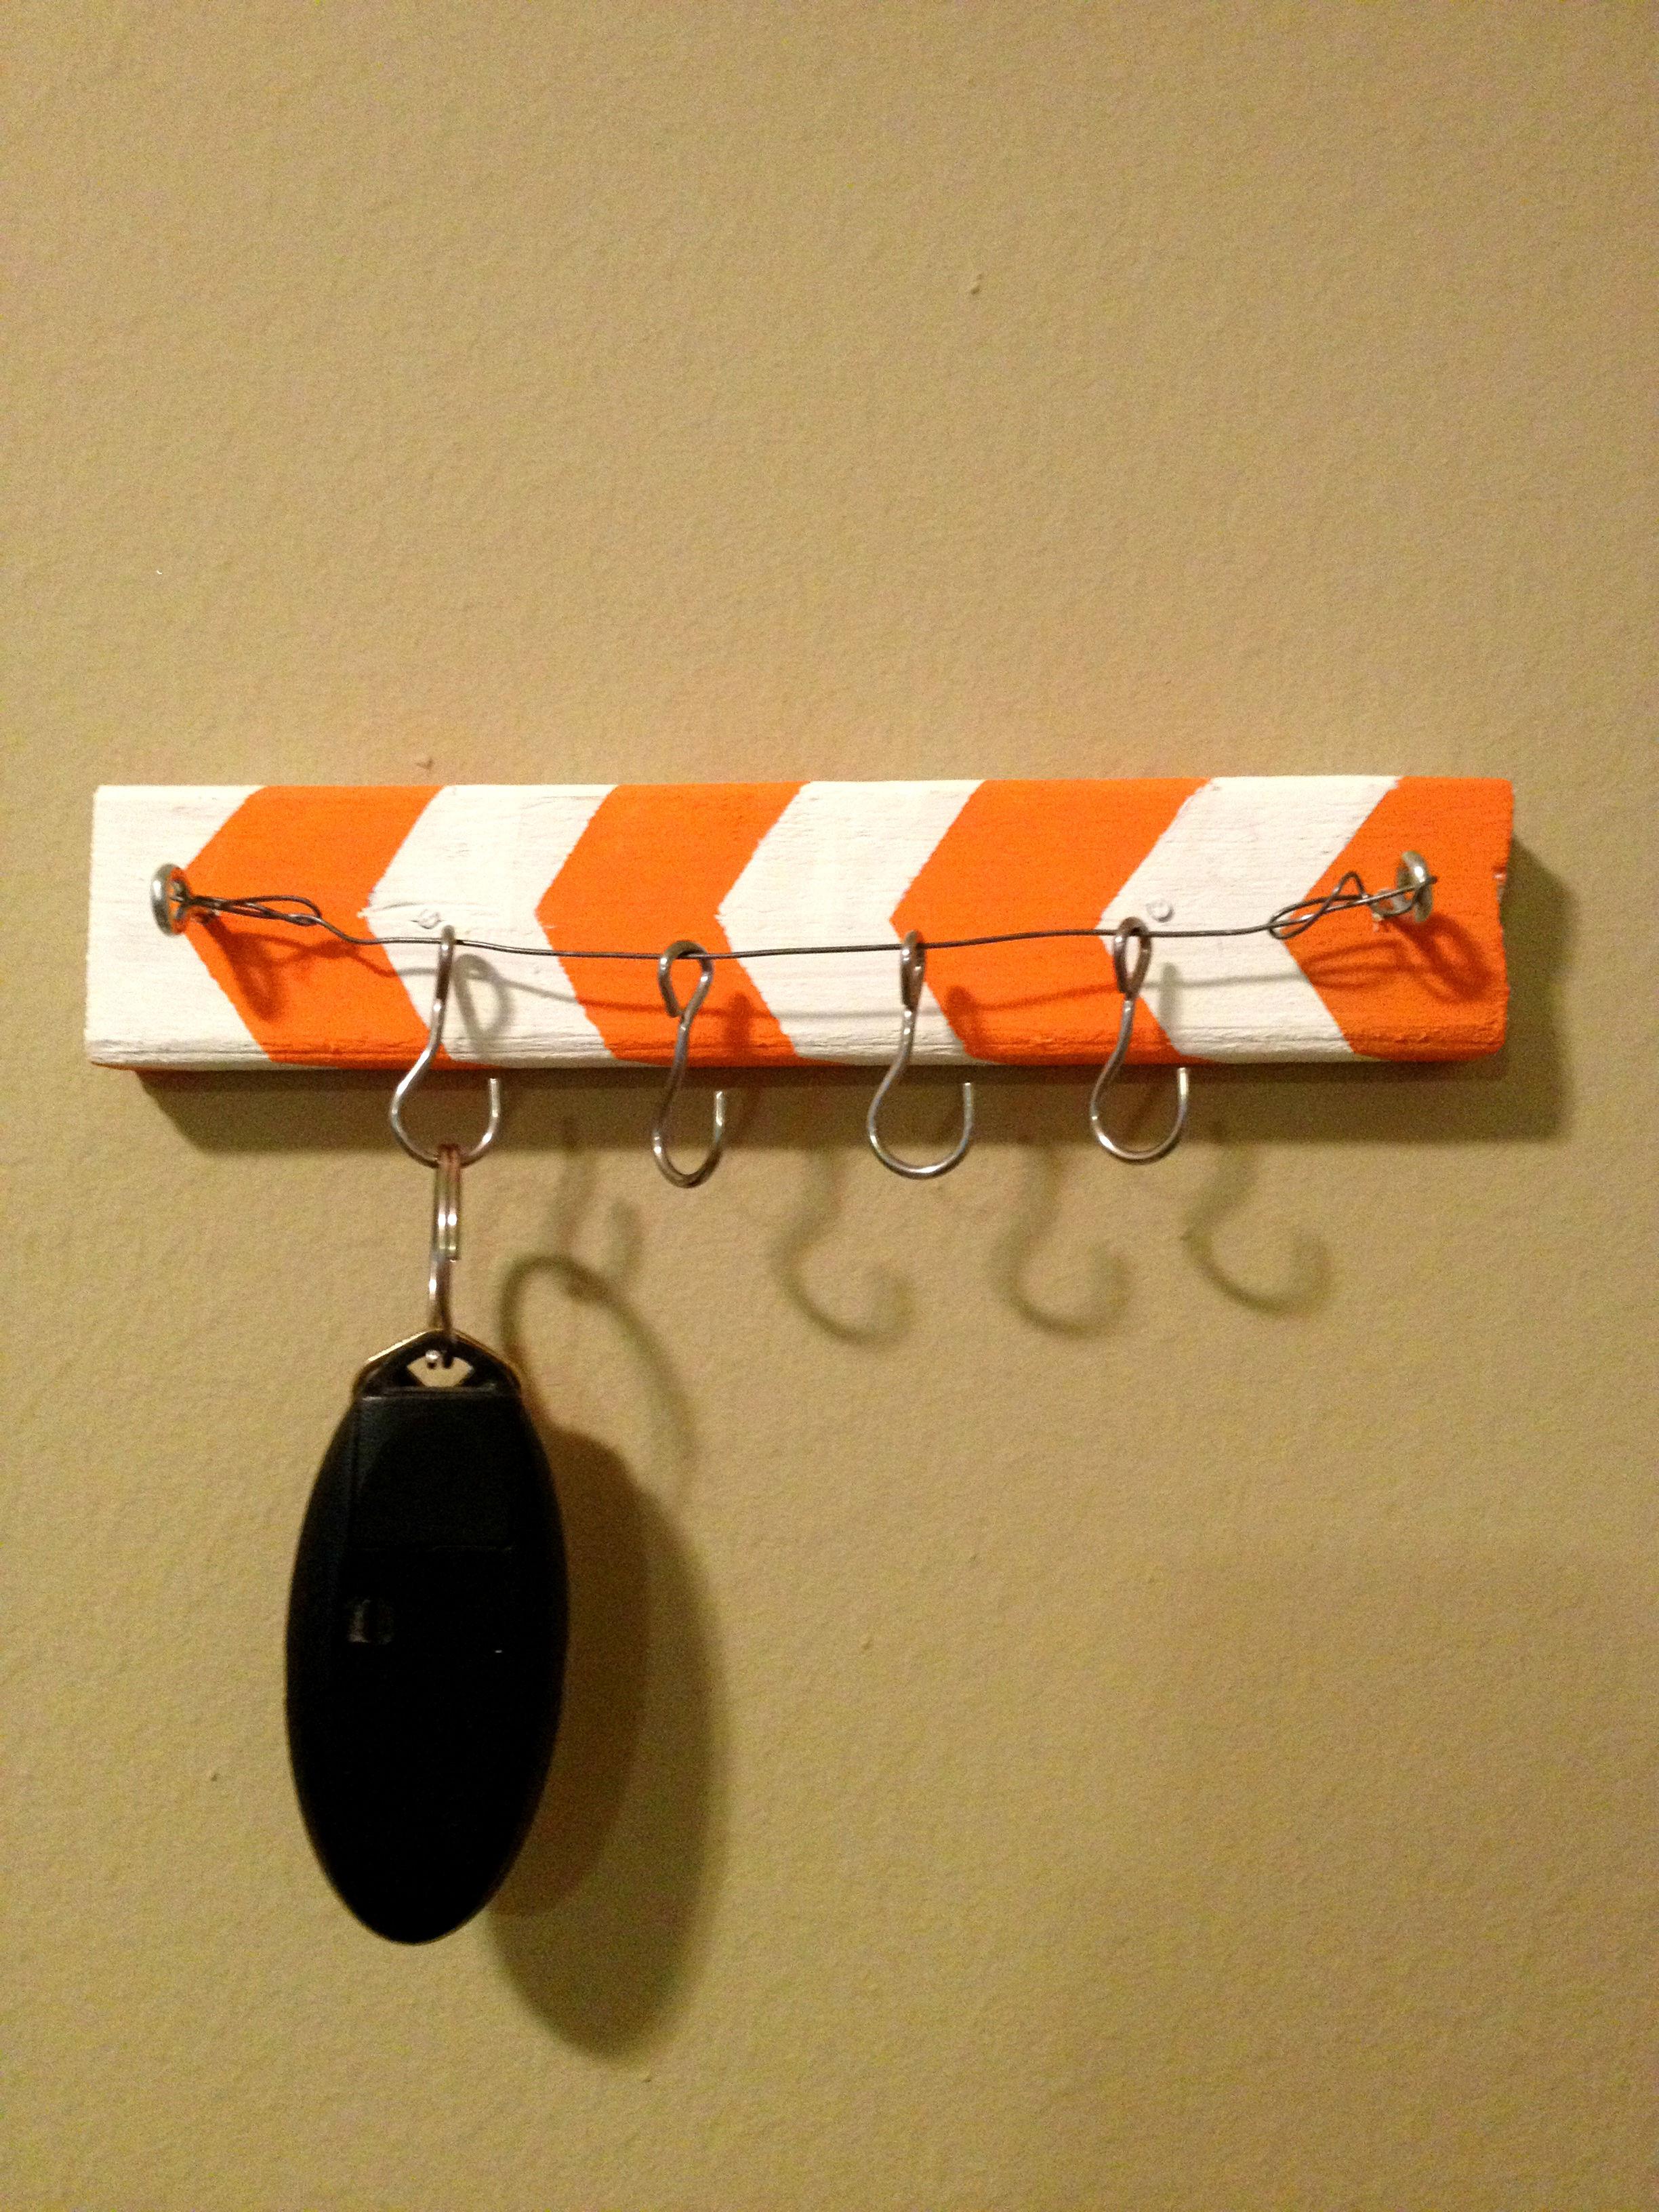 Best ideas about DIY Key Organizer . Save or Pin DIY Key Holder Now.